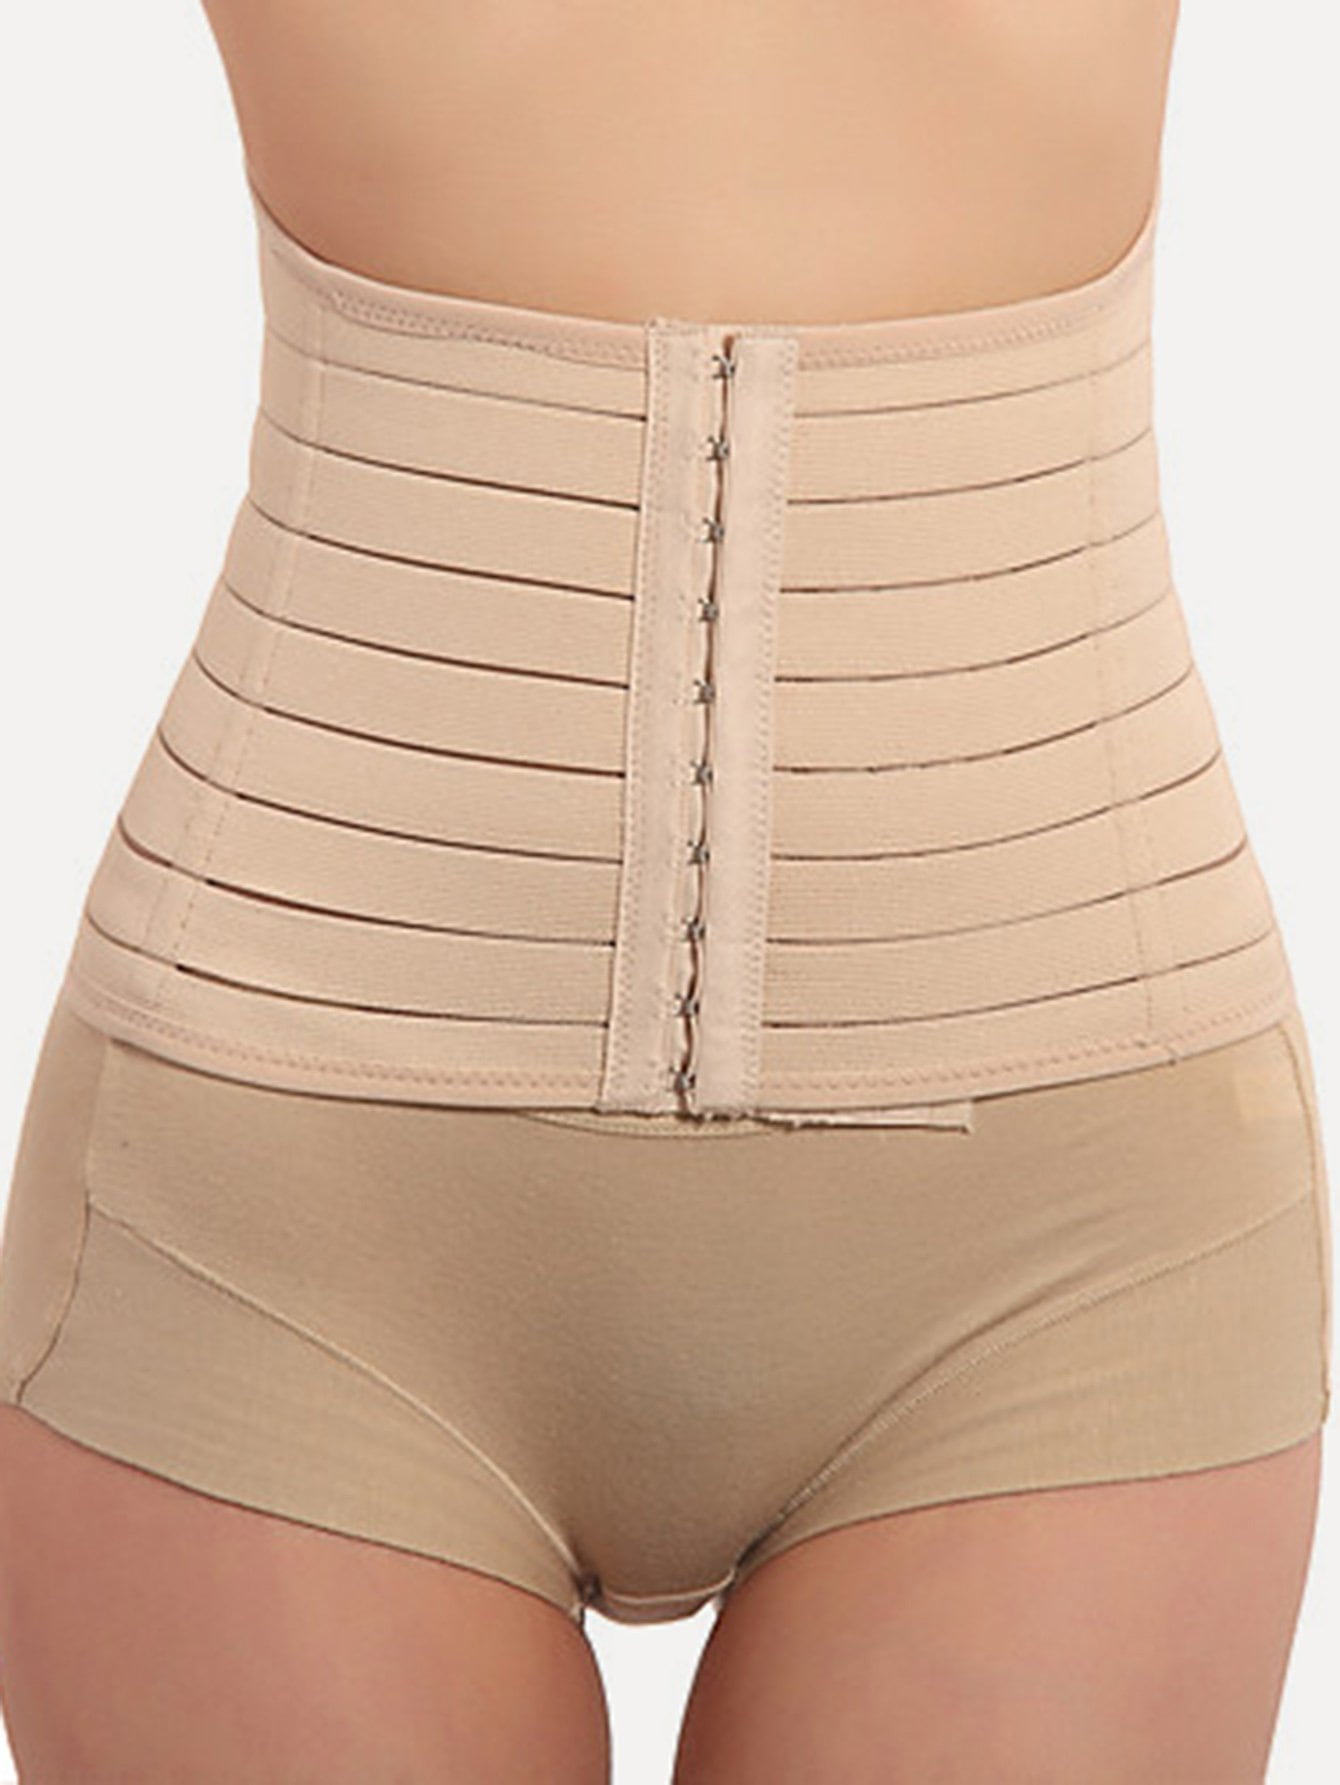 Hook Front Corset Shapewear zipper shapewear corset